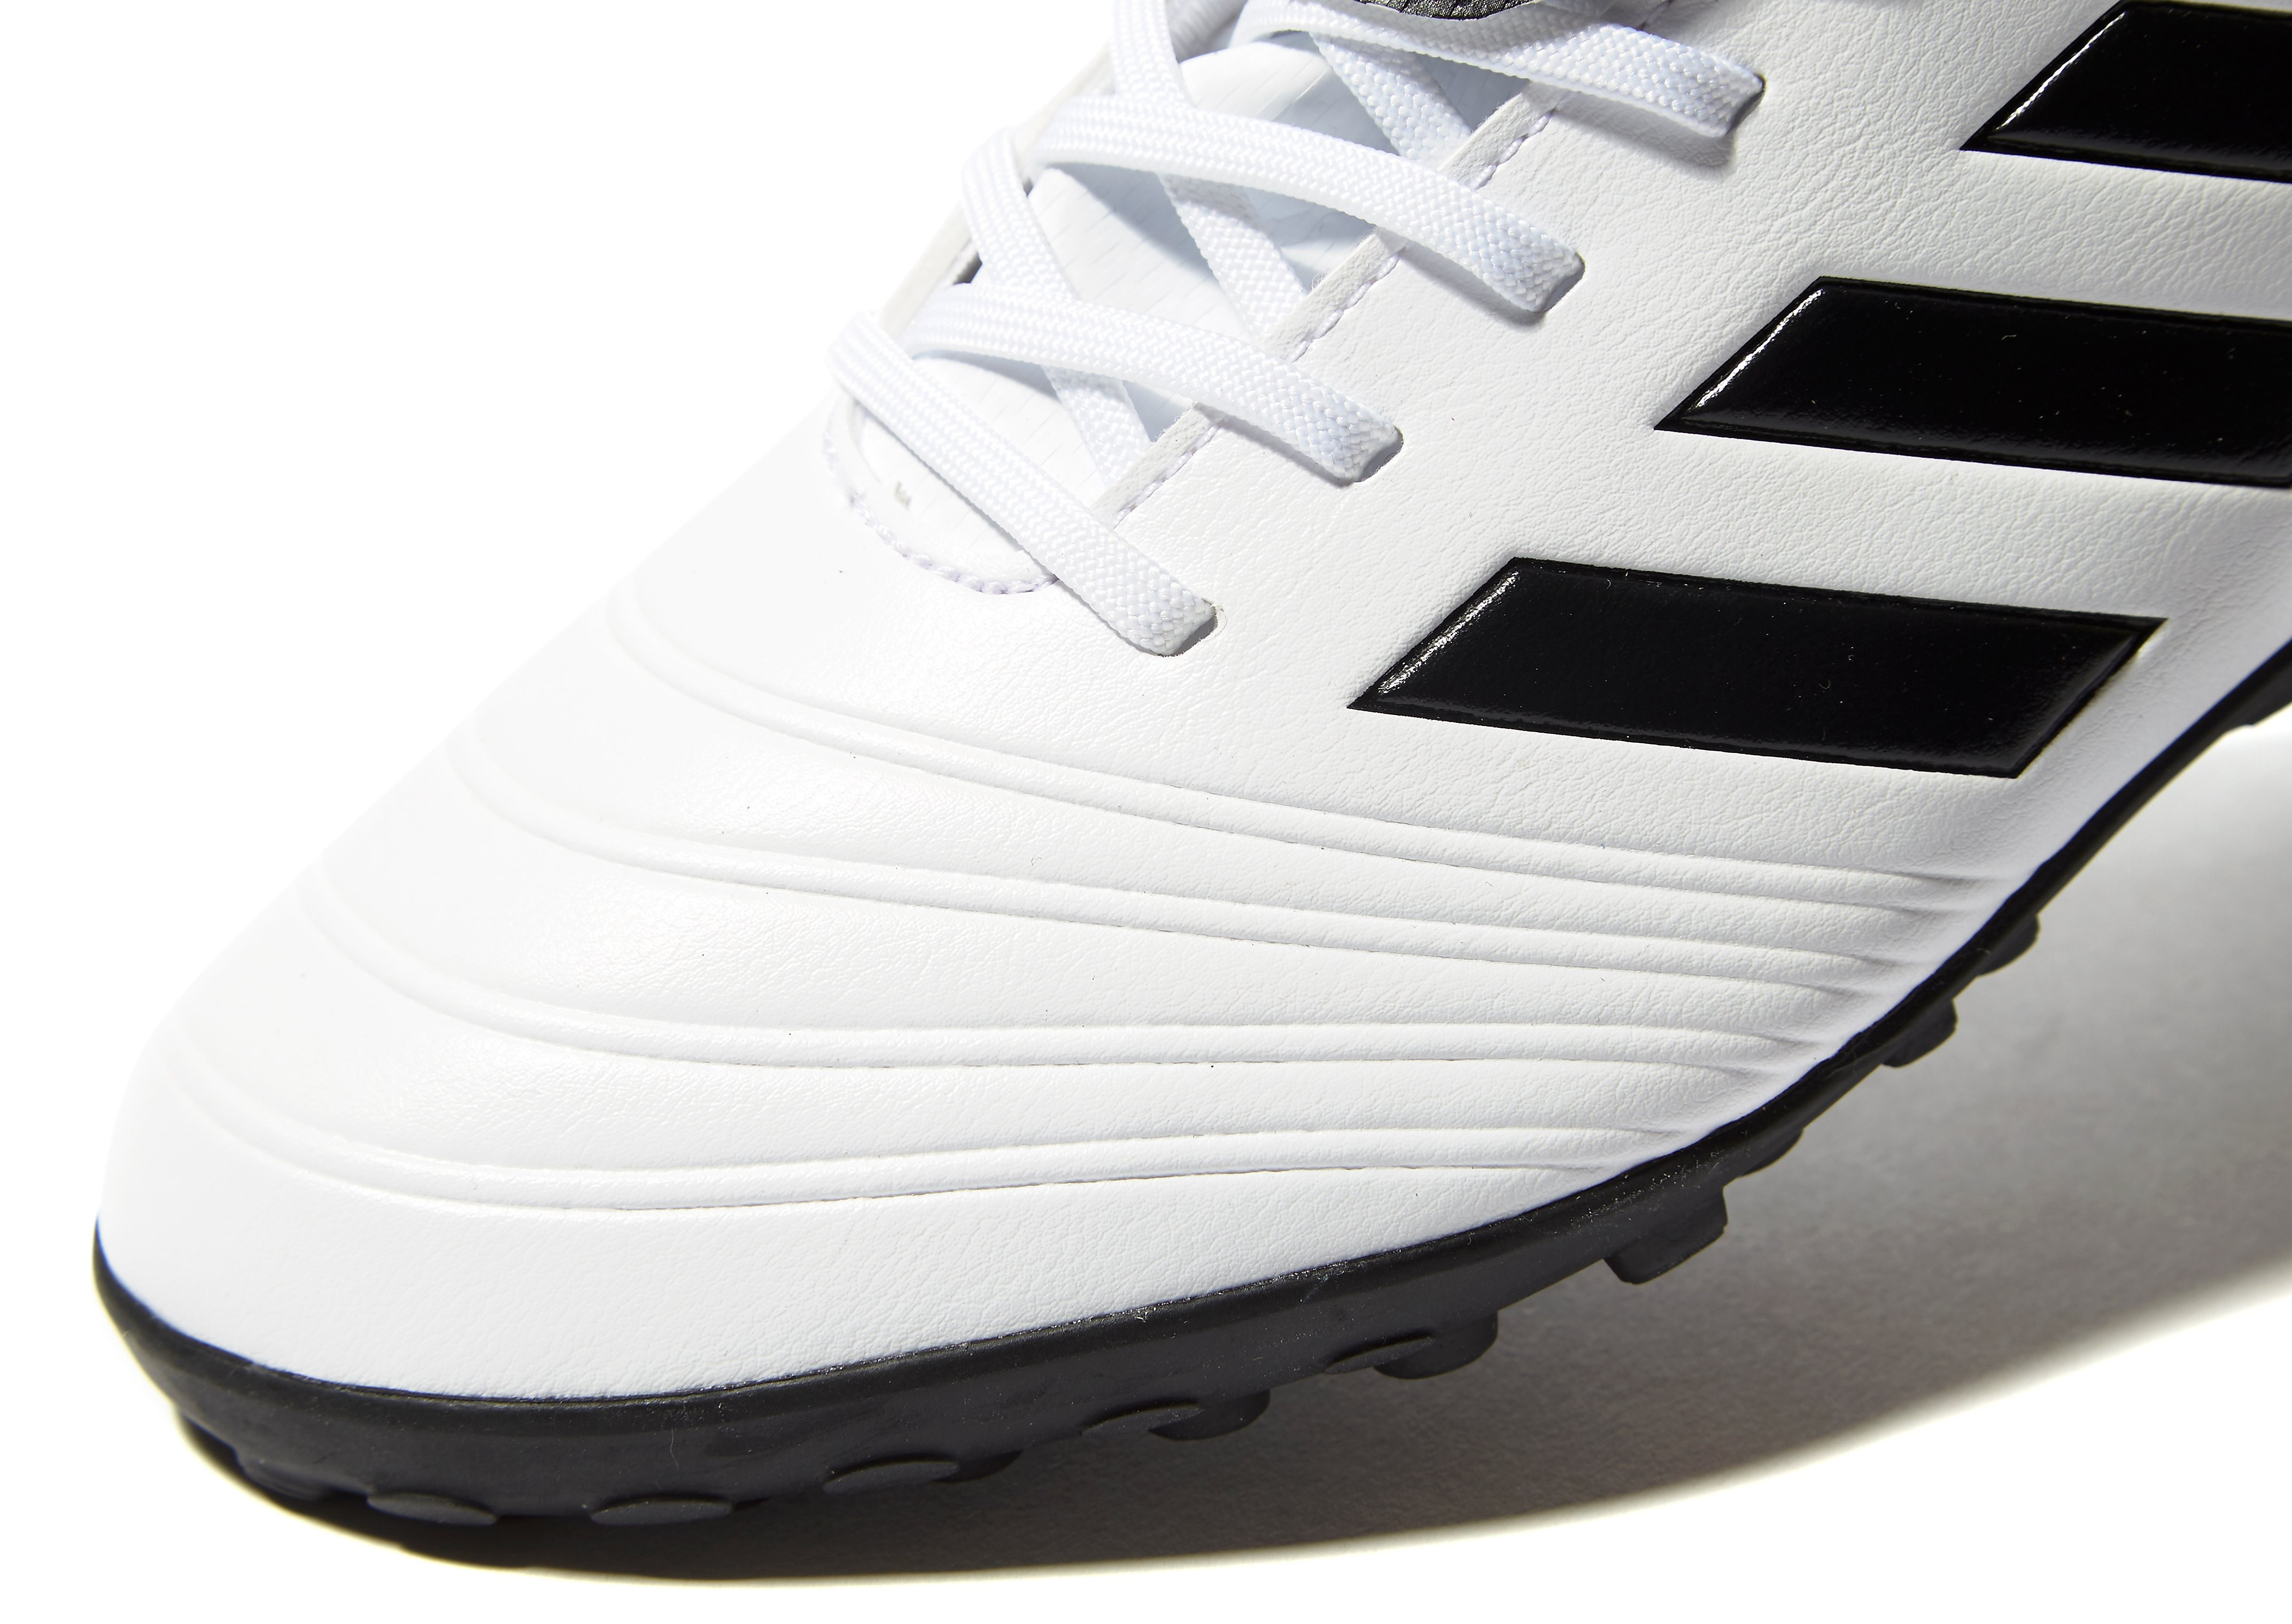 adidas SkyStalker Copa 18.4 TF